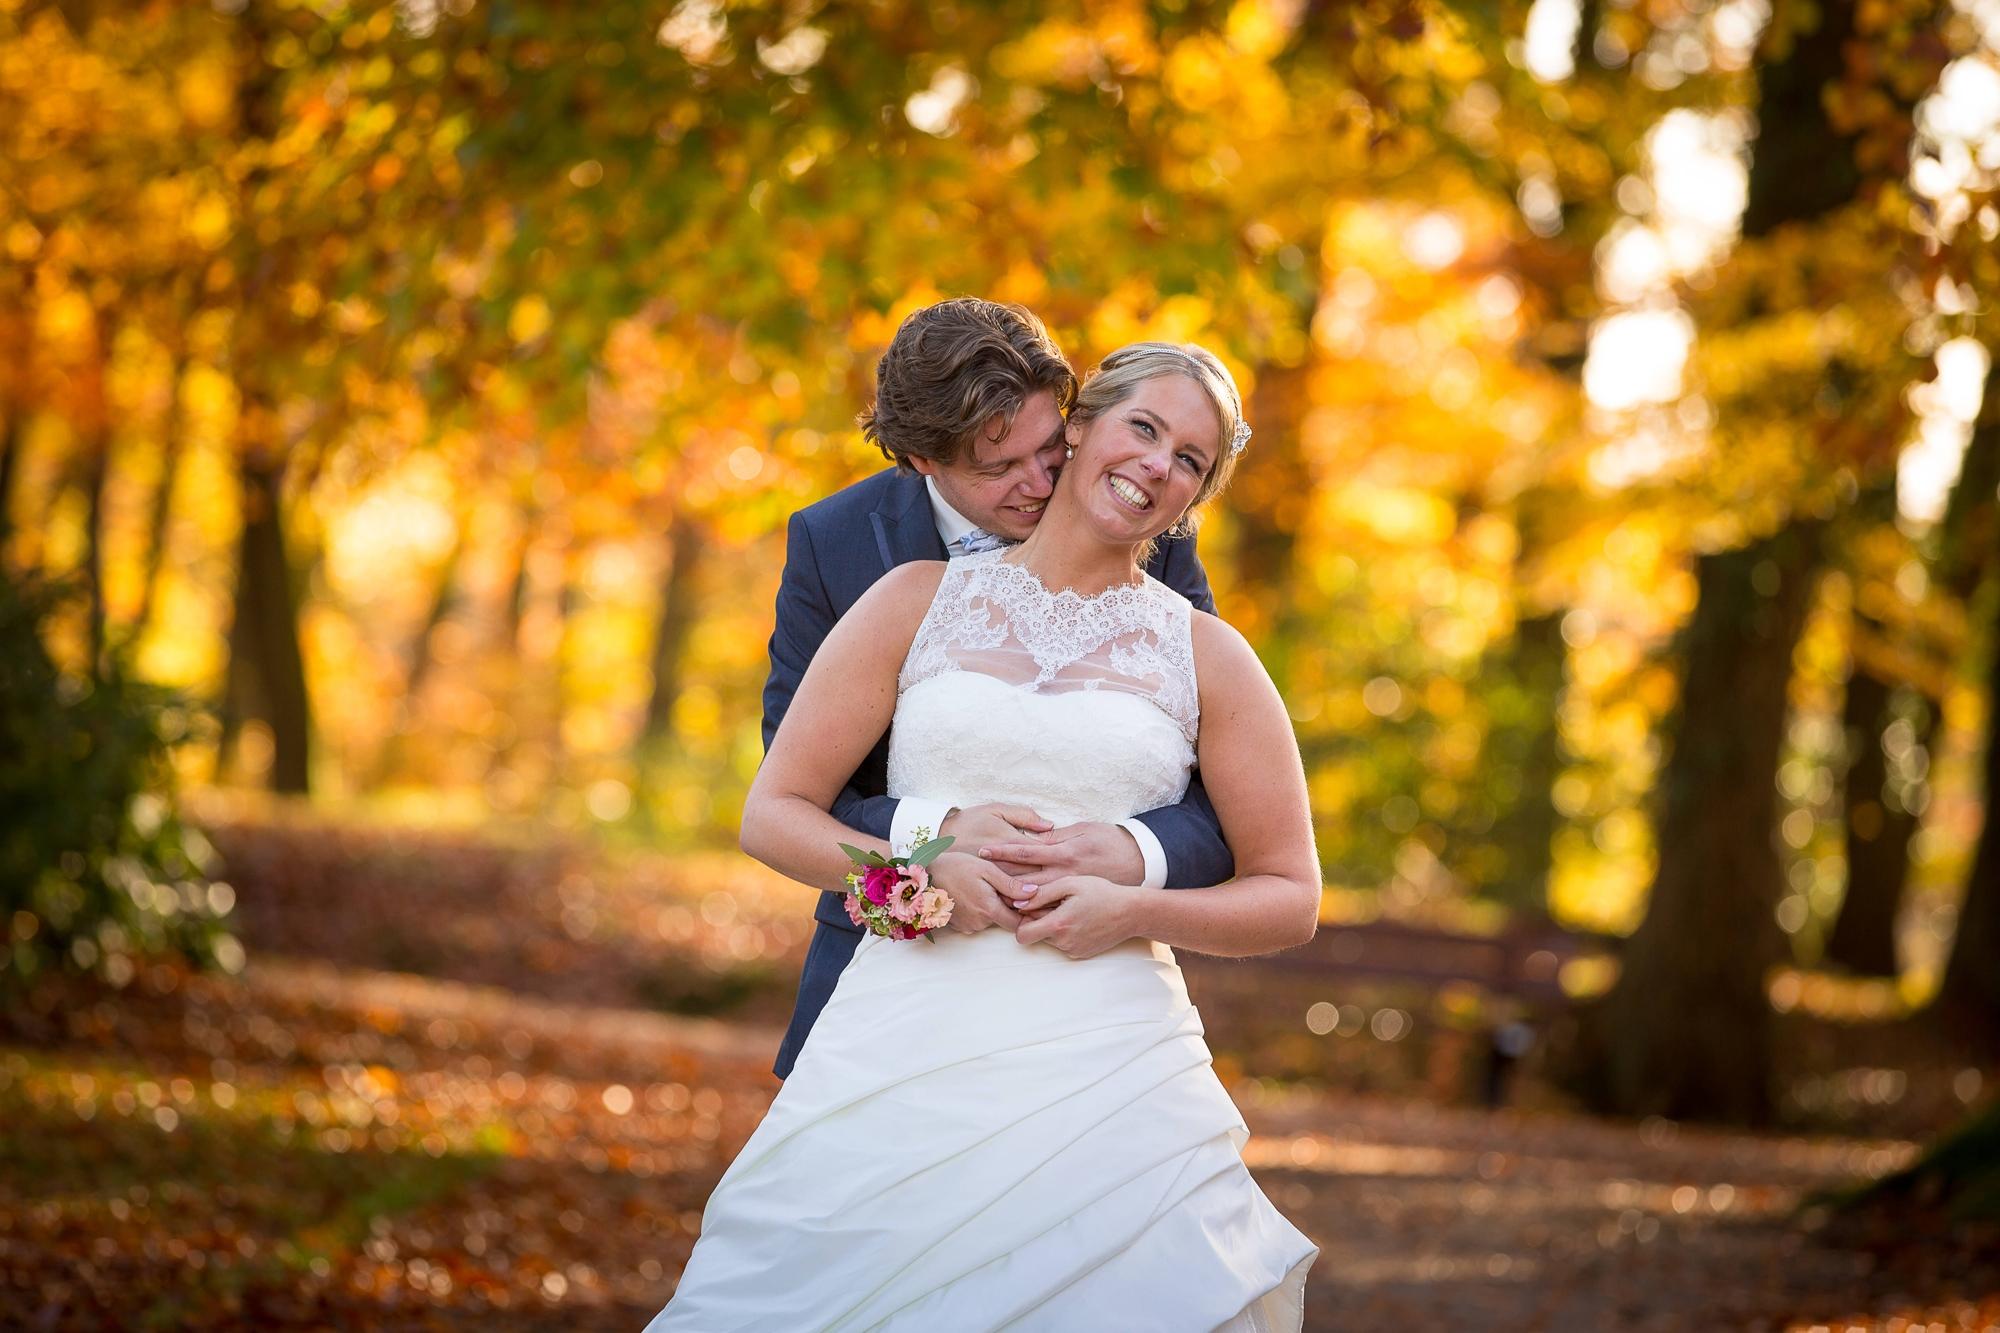 bruidsfotografie-trouwreportage-huwelijksfotografie-bruidsfotograaf-feestfotografie-Ingeborg en Martijn-29.jpg